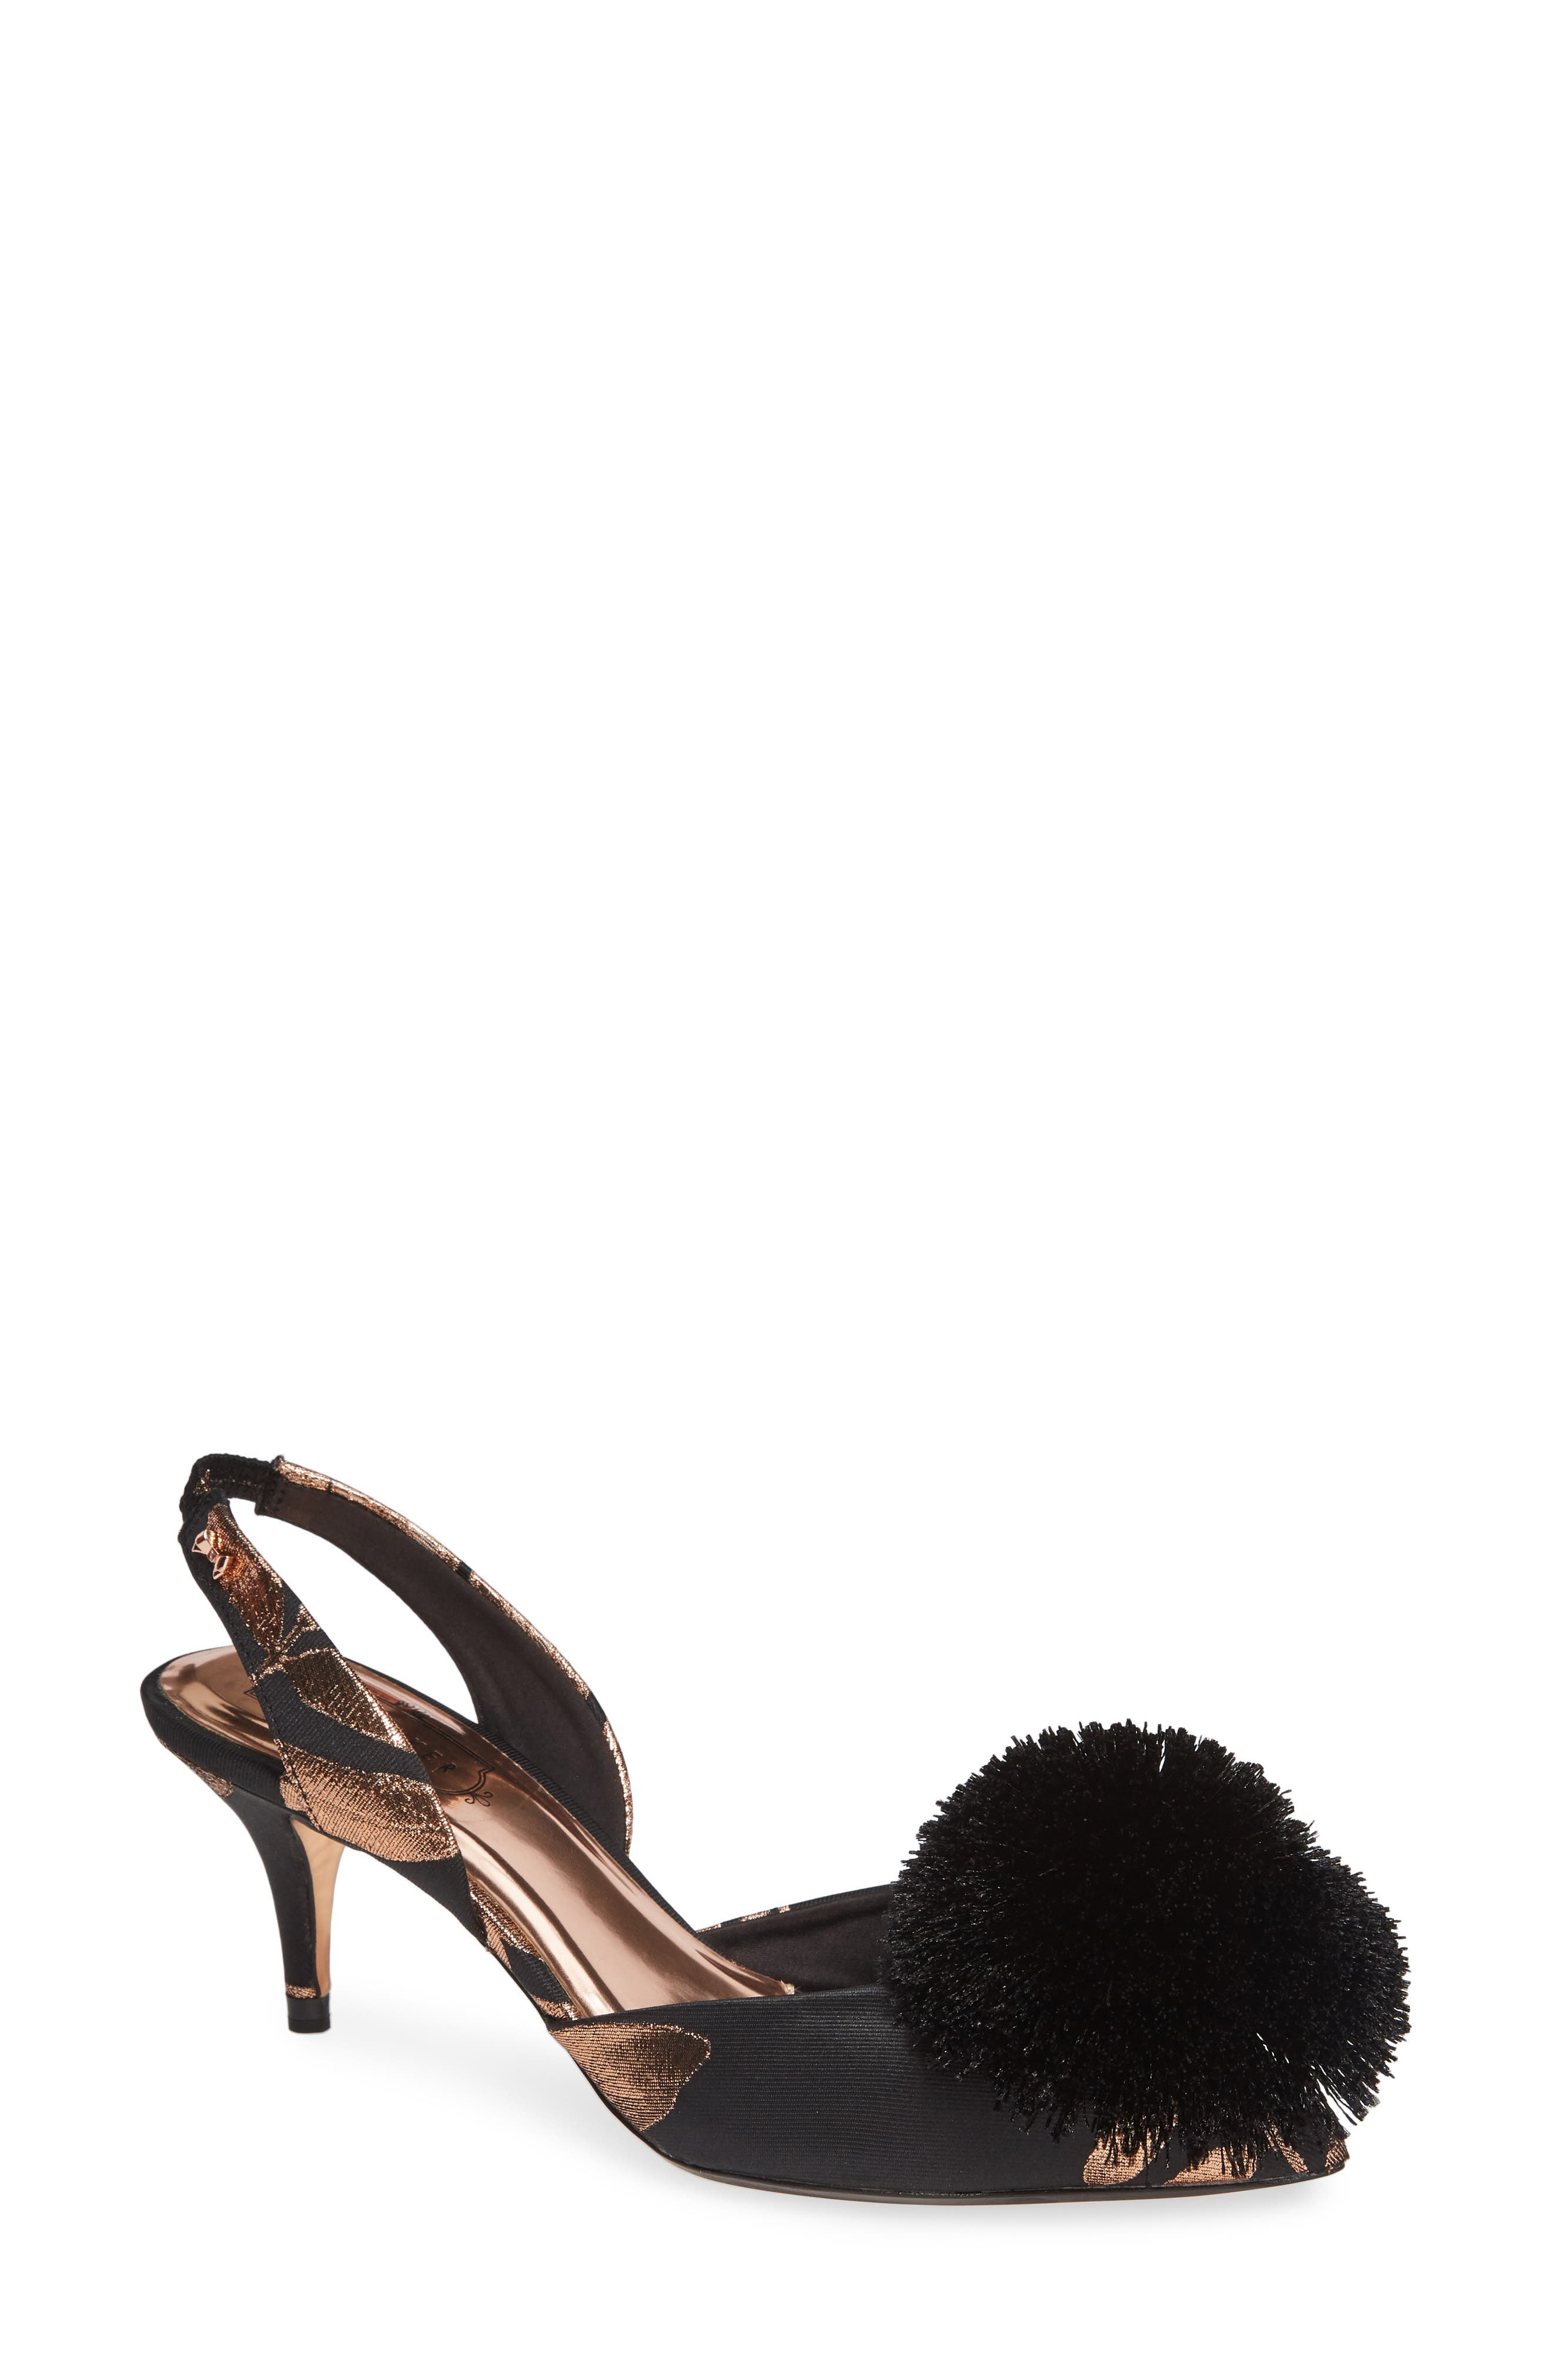 TED BAKER LONDON Mikali Yarn Pouf Sandal, Main, color, BLACK KIRSTEN BOSCH